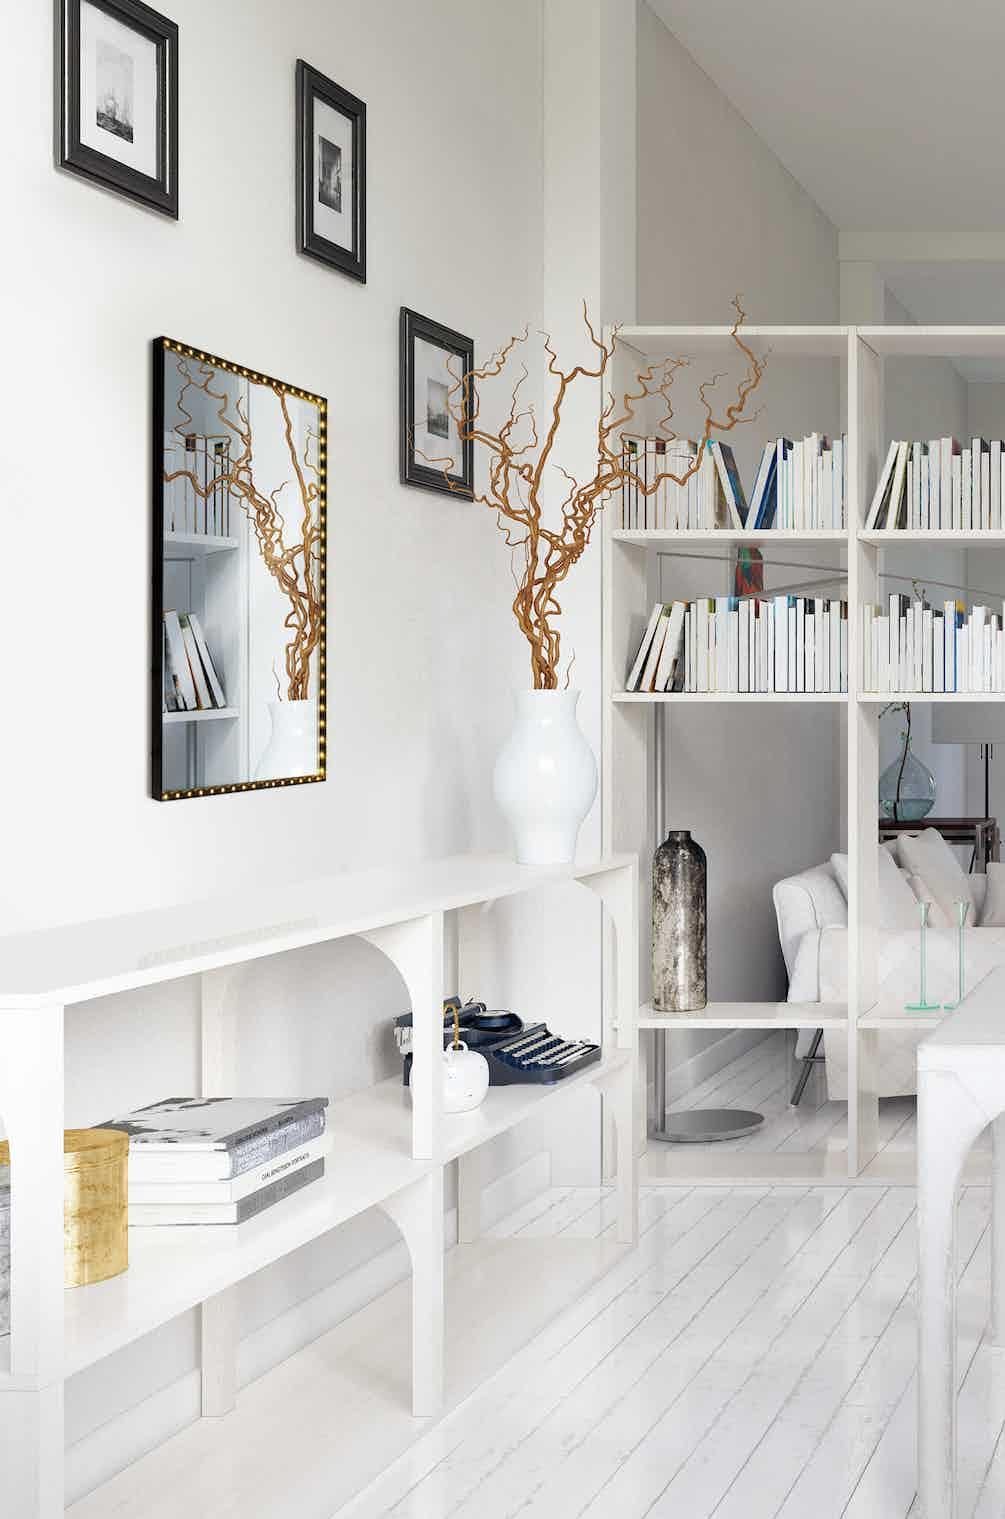 Le-deun-luminaires-vanity-square-wall-mirror-white-room-haute-living